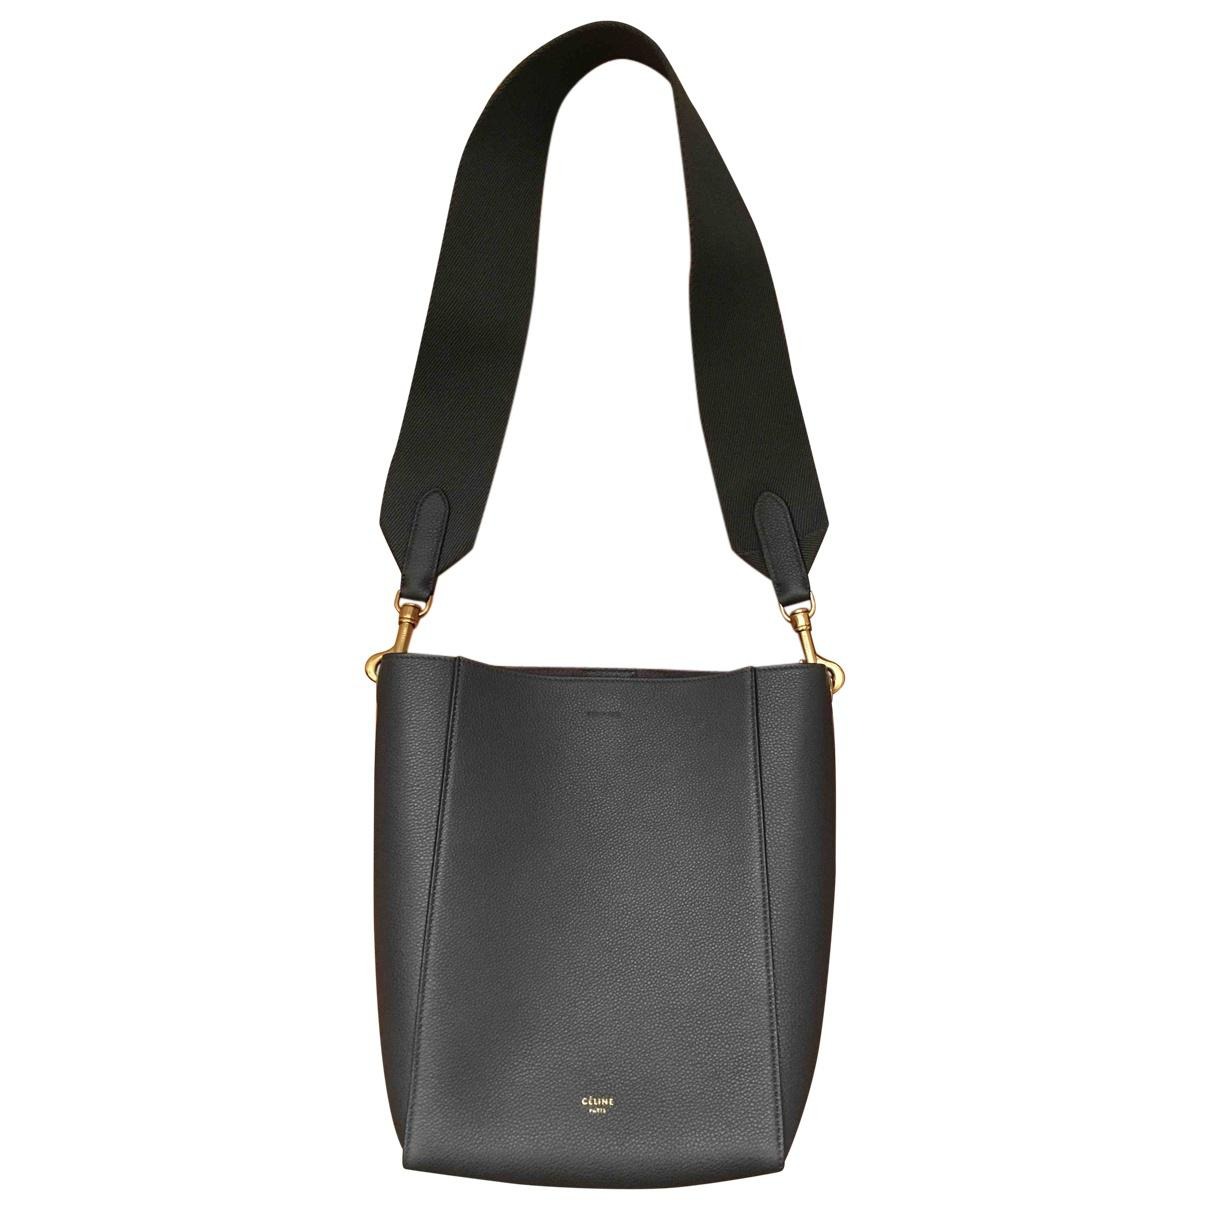 Céline Seau Sangle Leather Handbag in Gray - Lyst 88bc382d62512